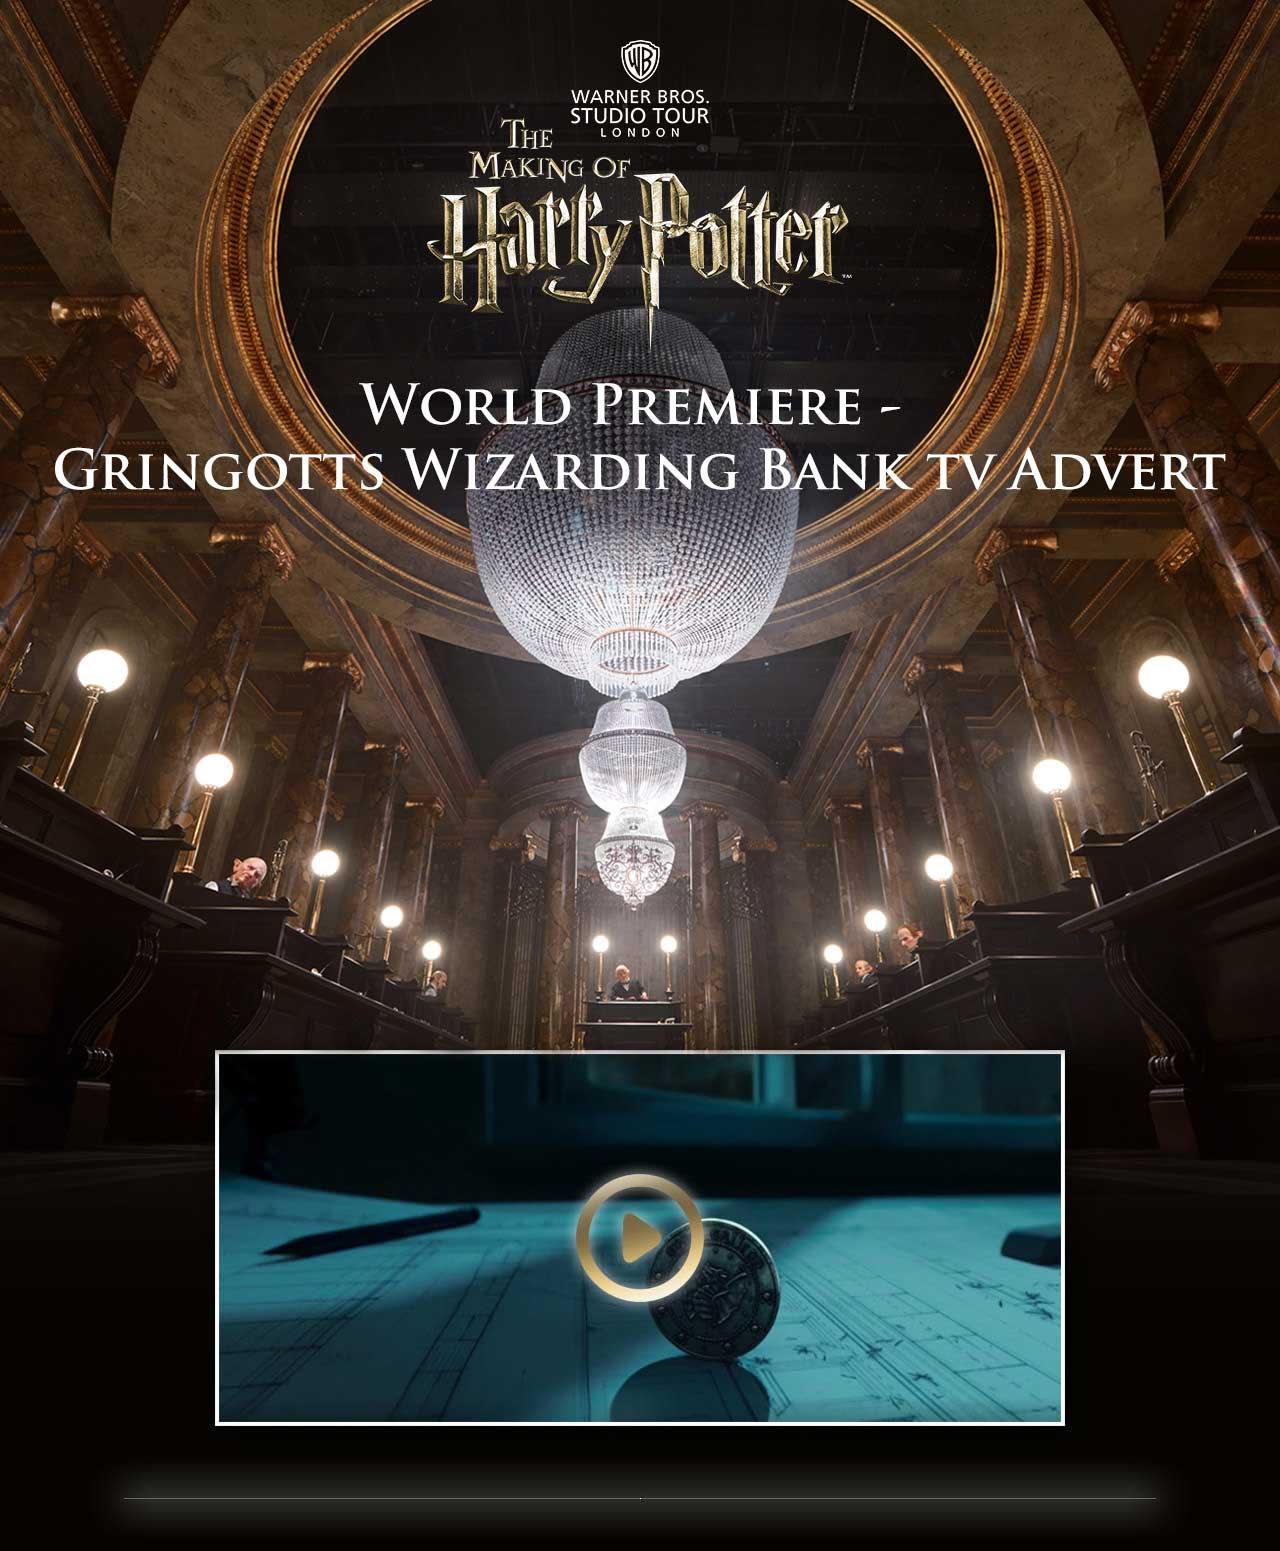 Warner Bros. Studio Tour London - The Making of Harry Potter | Gringotts Wizarding Bank